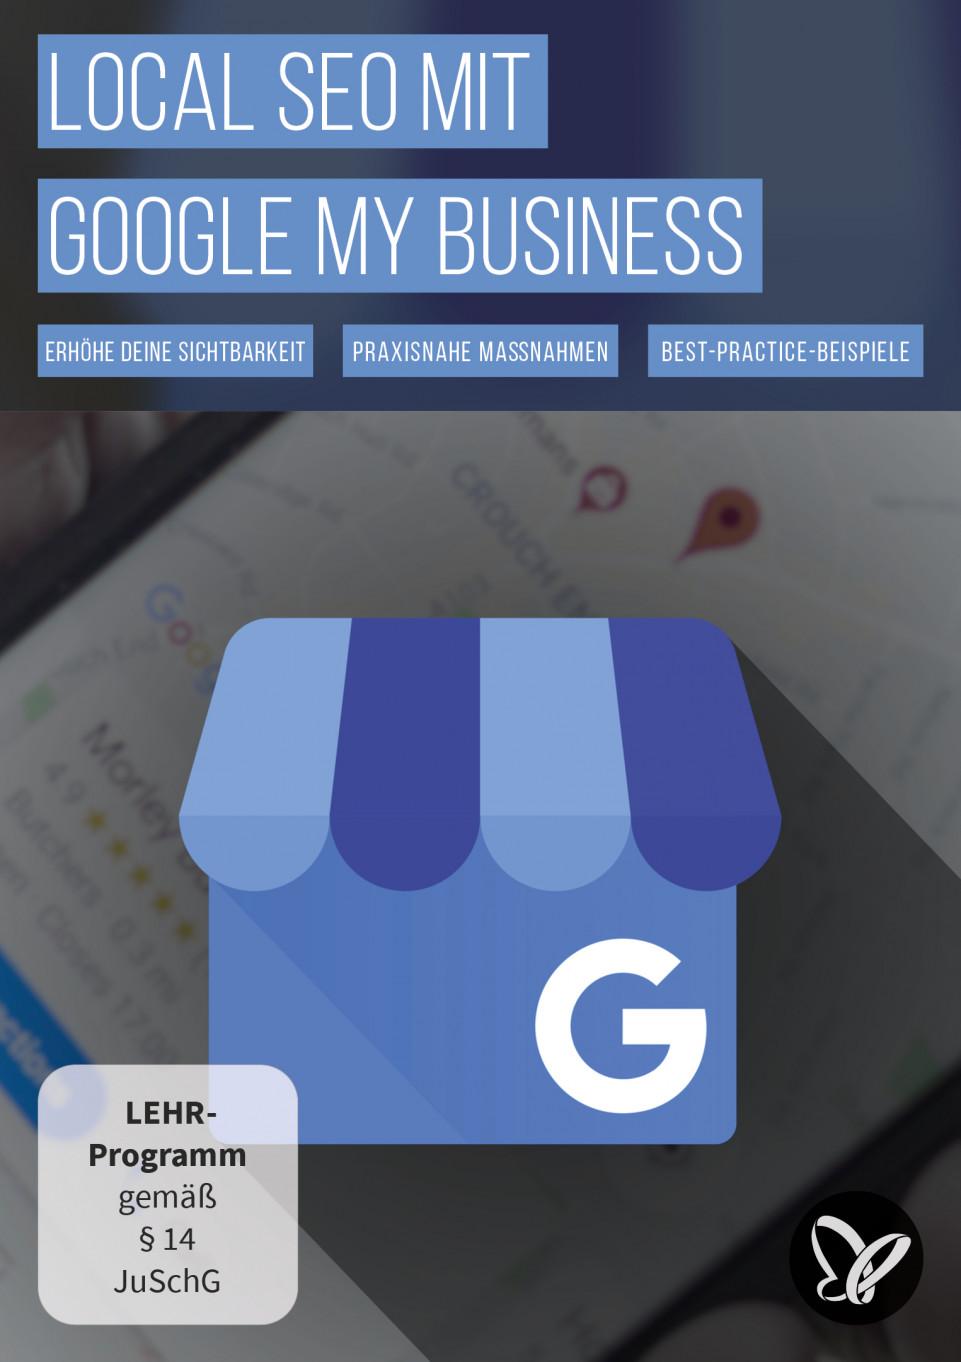 Local SEO – hohe Sichtbarkeit dank Google My Business & Google Maps